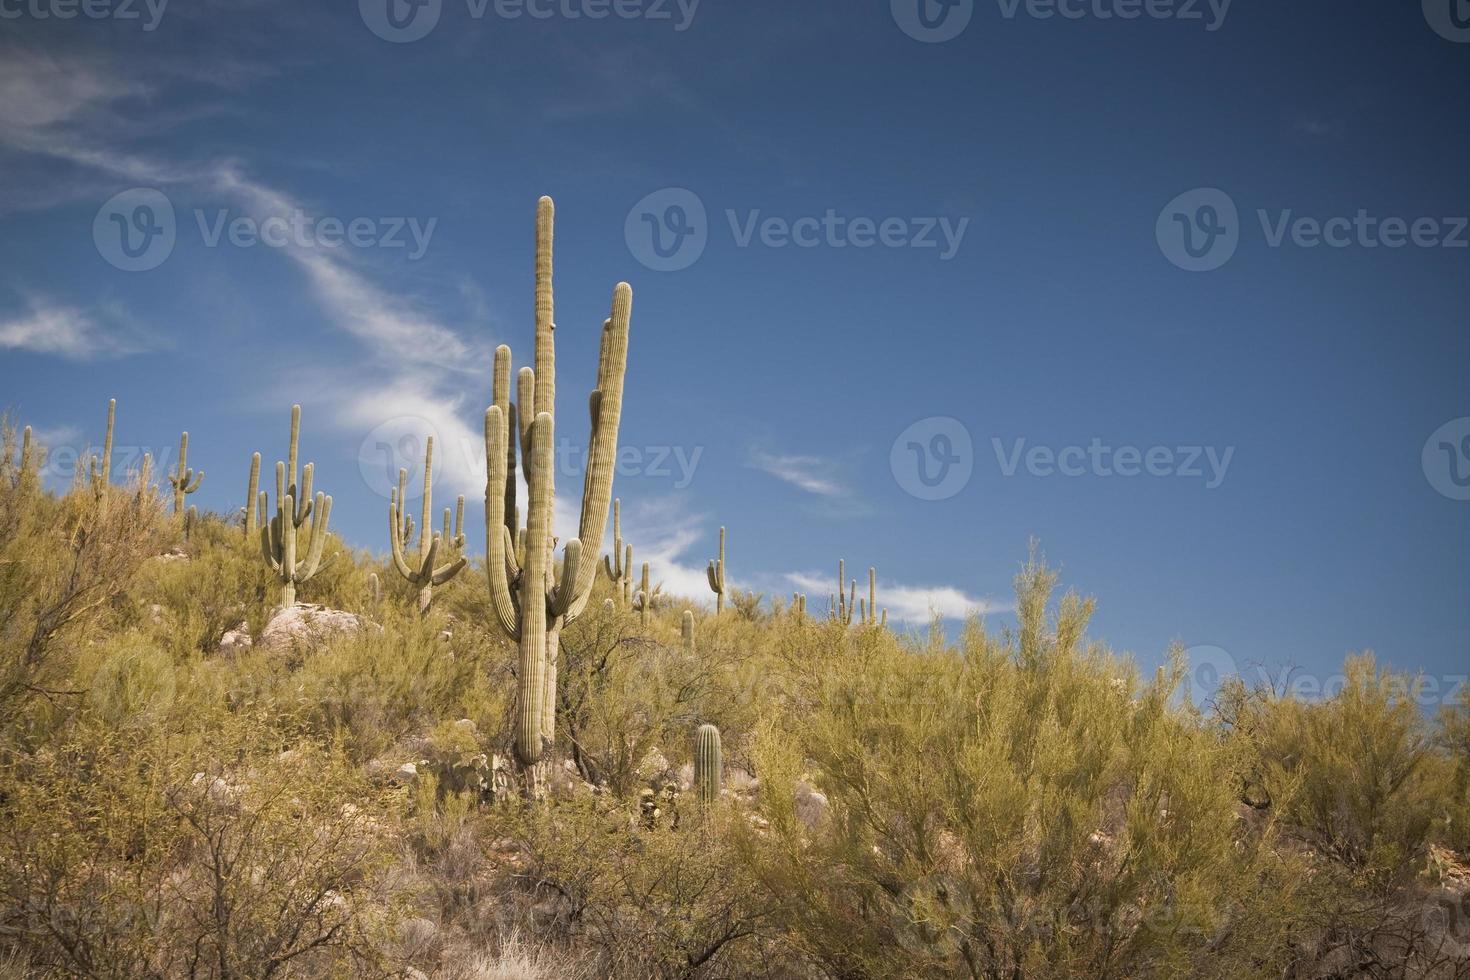 paesaggio desertico - 1 cactus con montagne foto